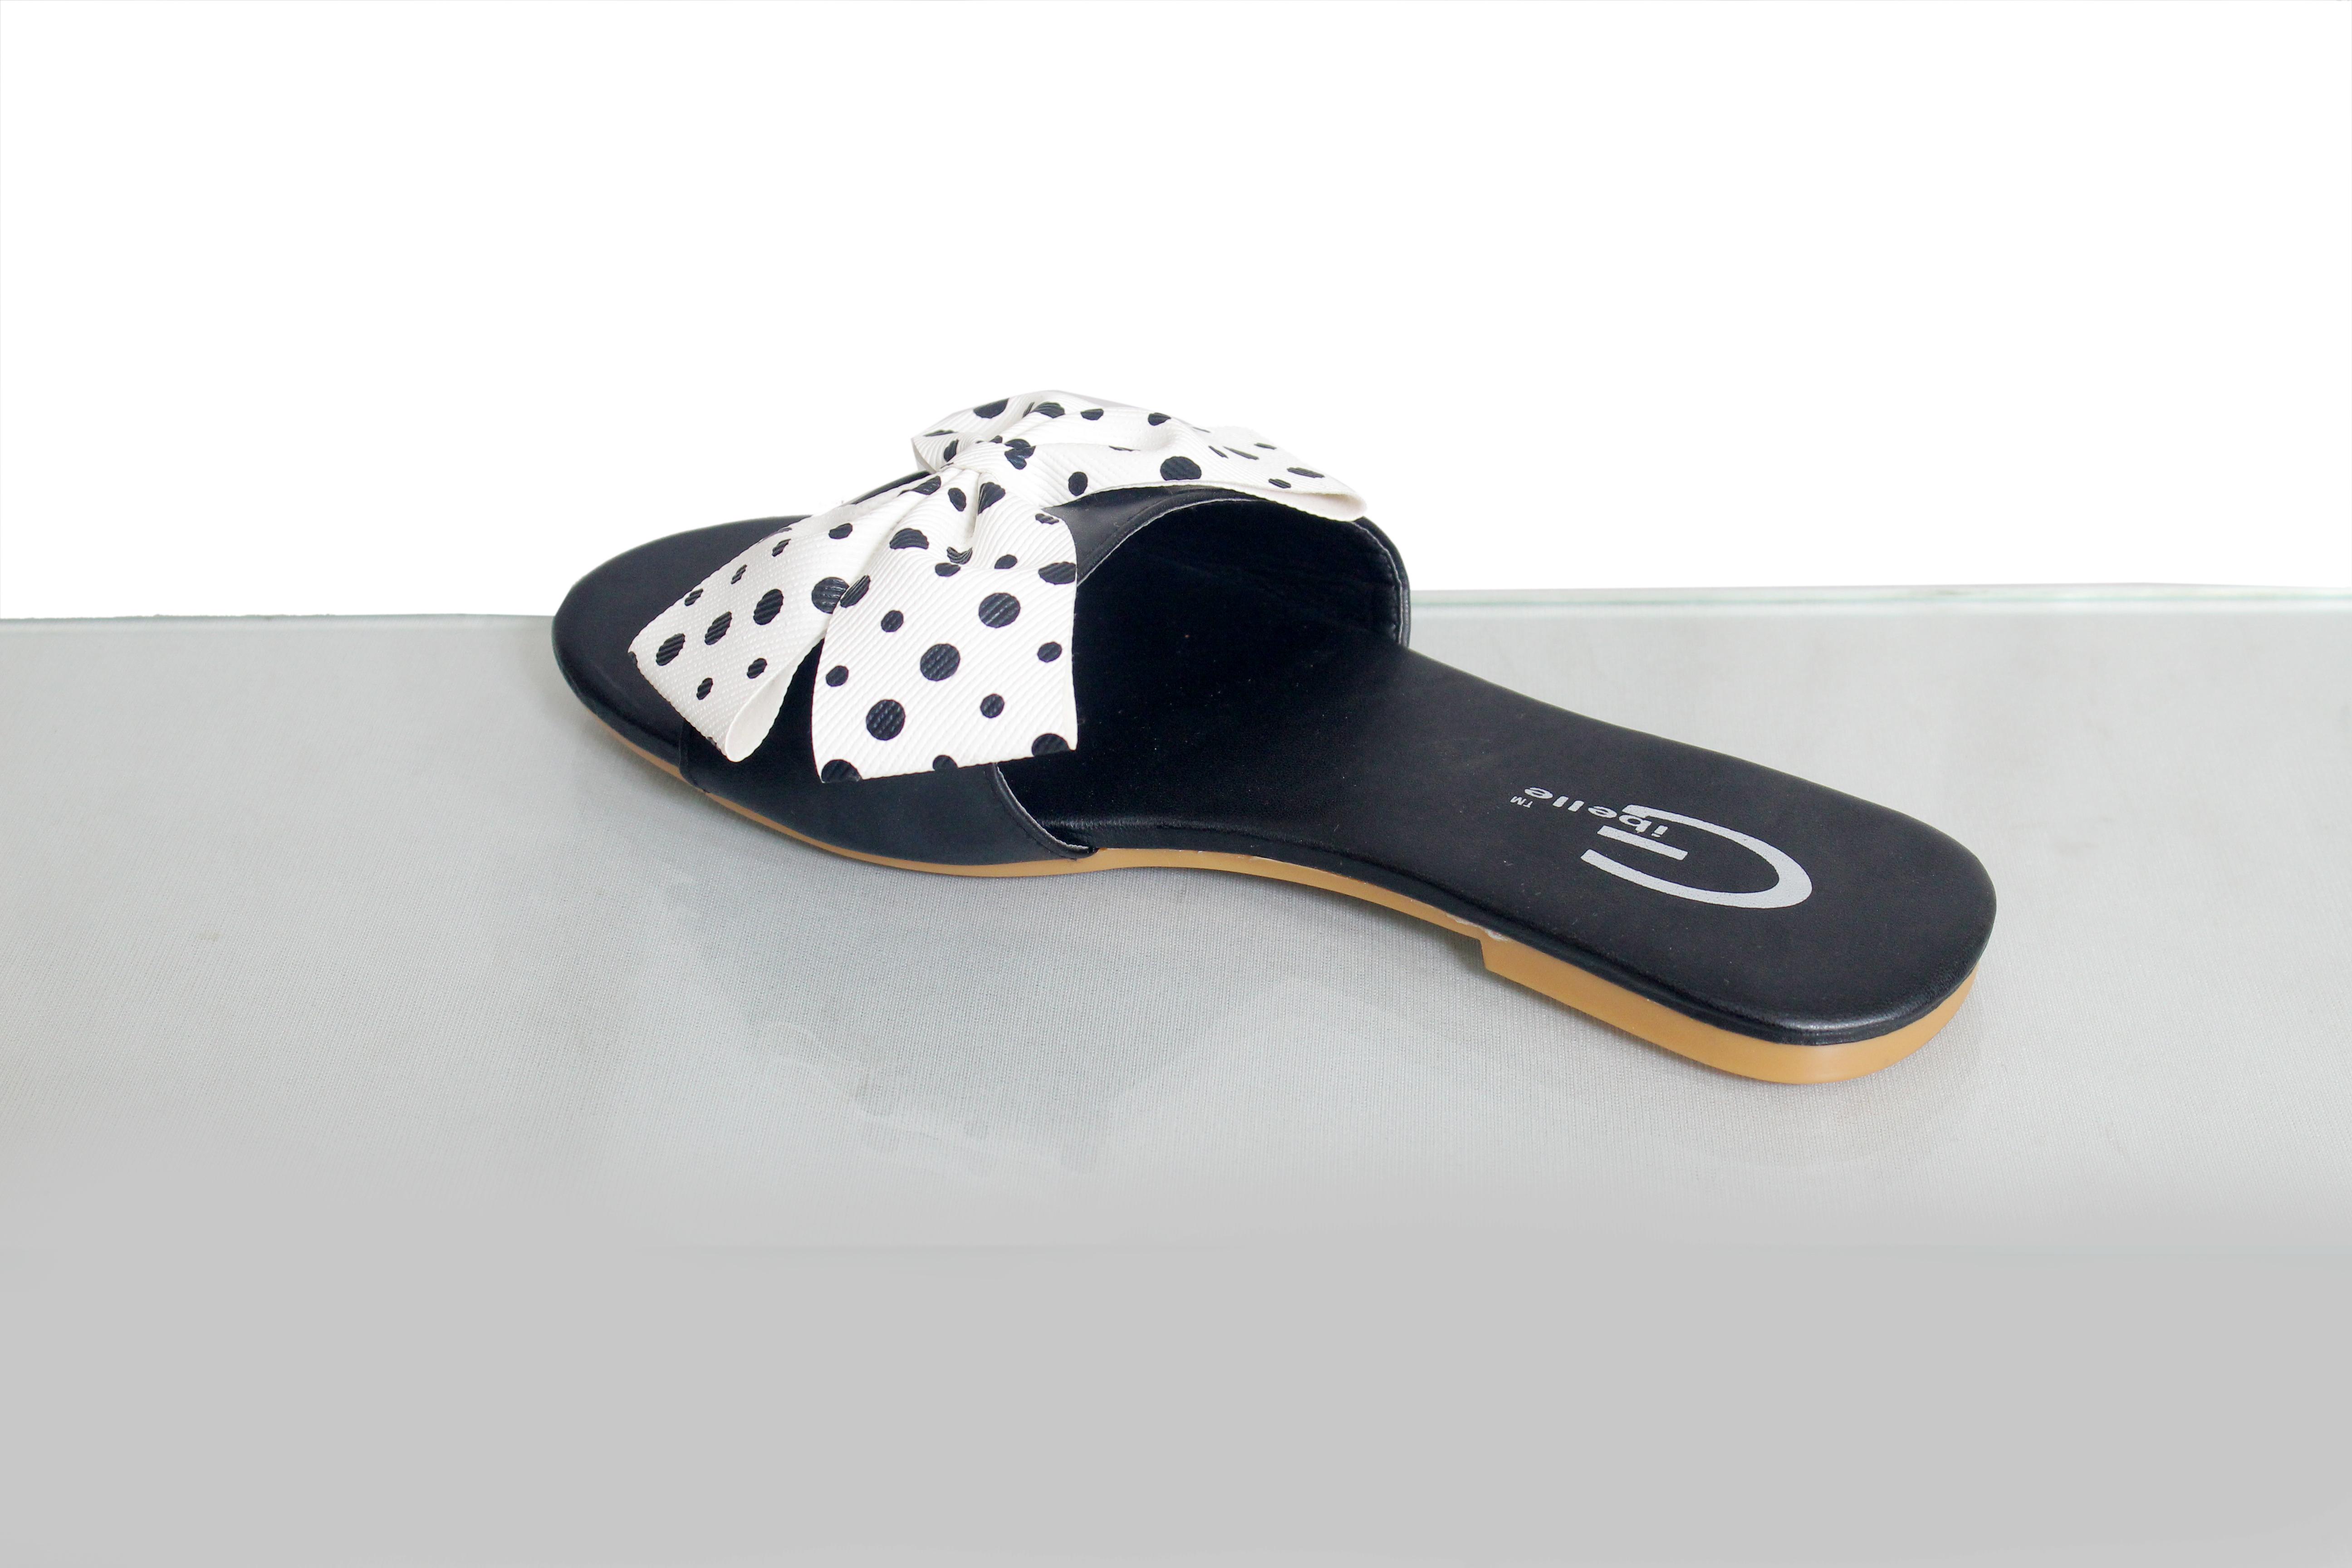 Gibelle Fancy Women's Black Casual Flat Sandals GWF-029-WB (Black, 36-40, 5 PAIR)